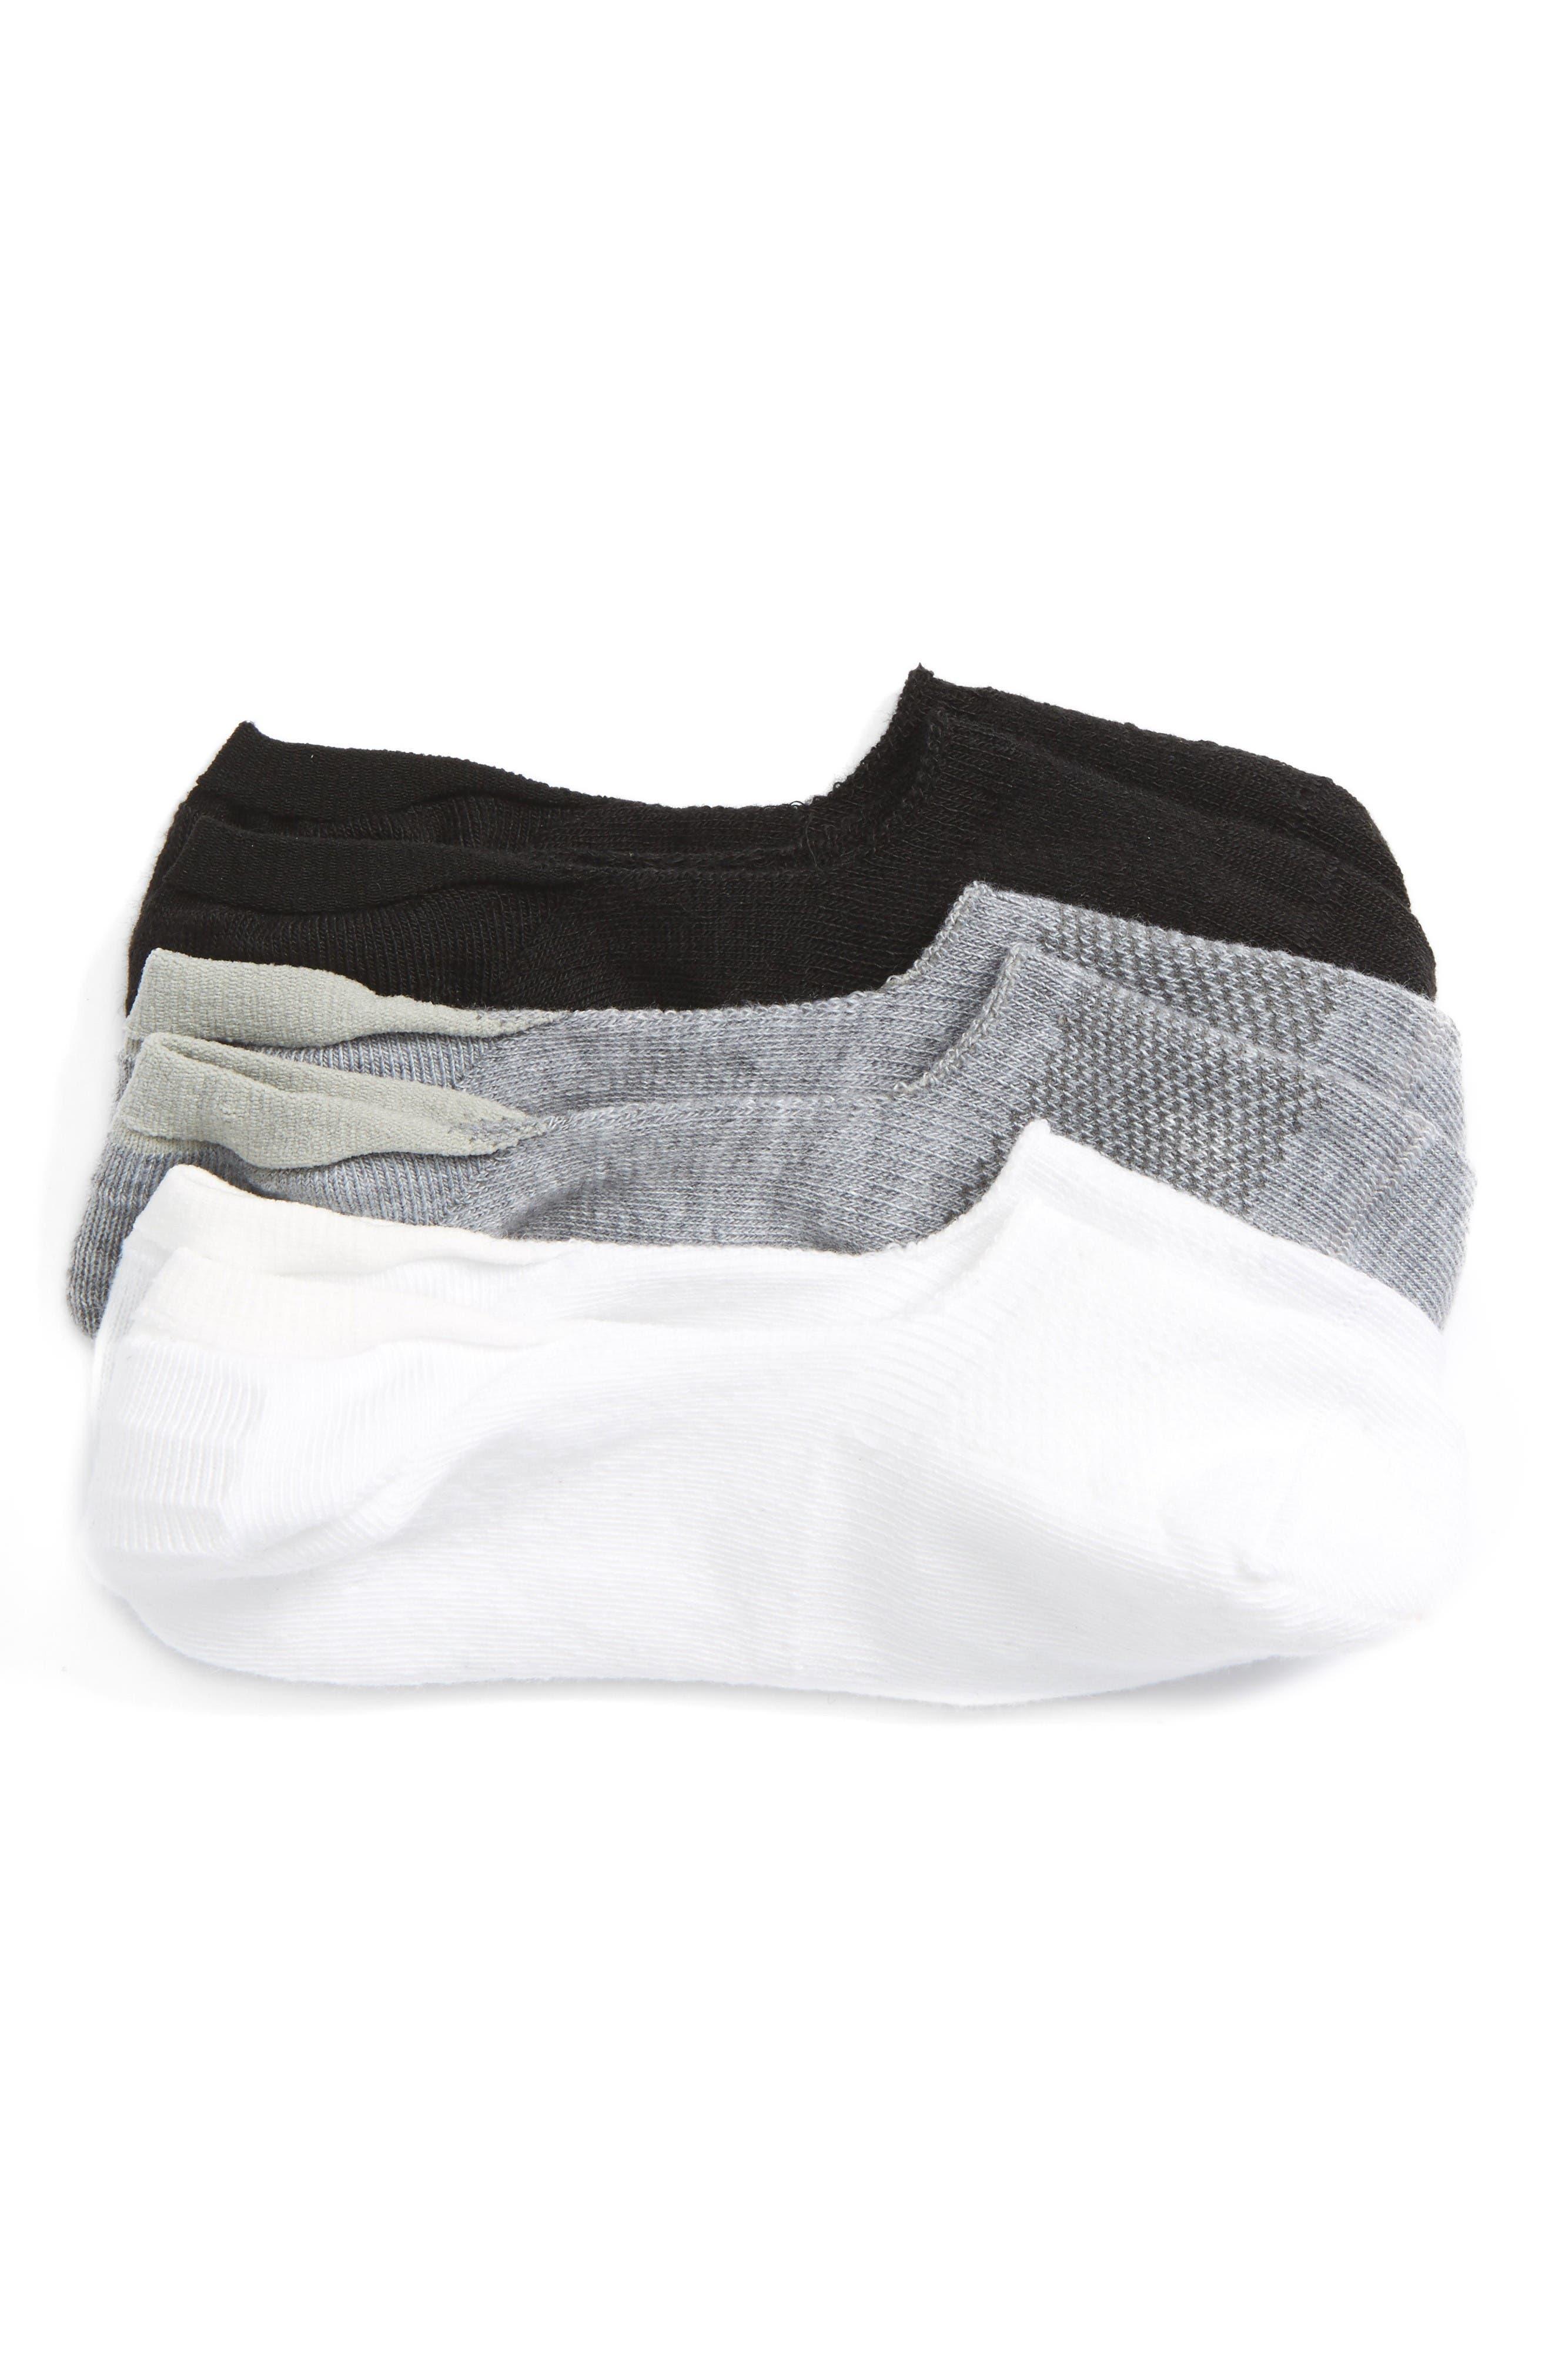 Tucker + Tate Assorted 3-Pack Liner Socks (Walker, Toddler, Little Kid & Big Kid)